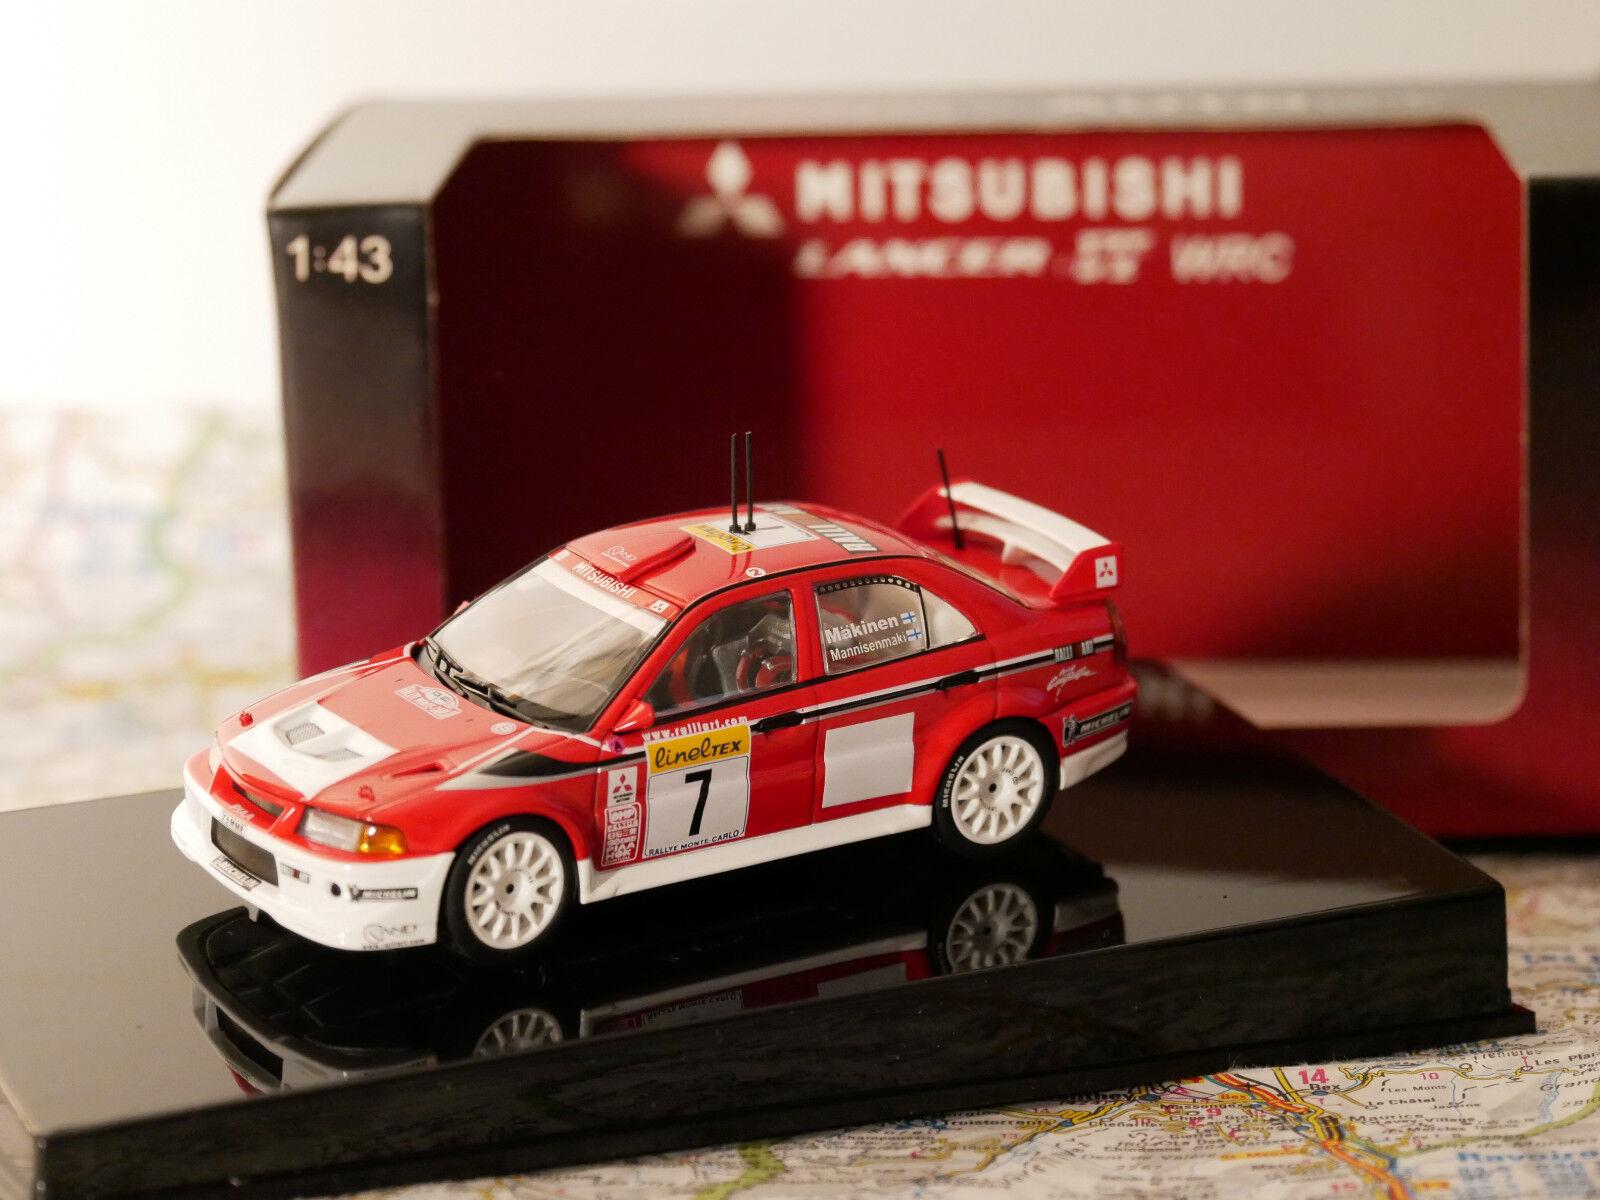 Autoart lancer evo 6 wcr rallye monte carlo 2001 sieger art.60141 neue 1 43